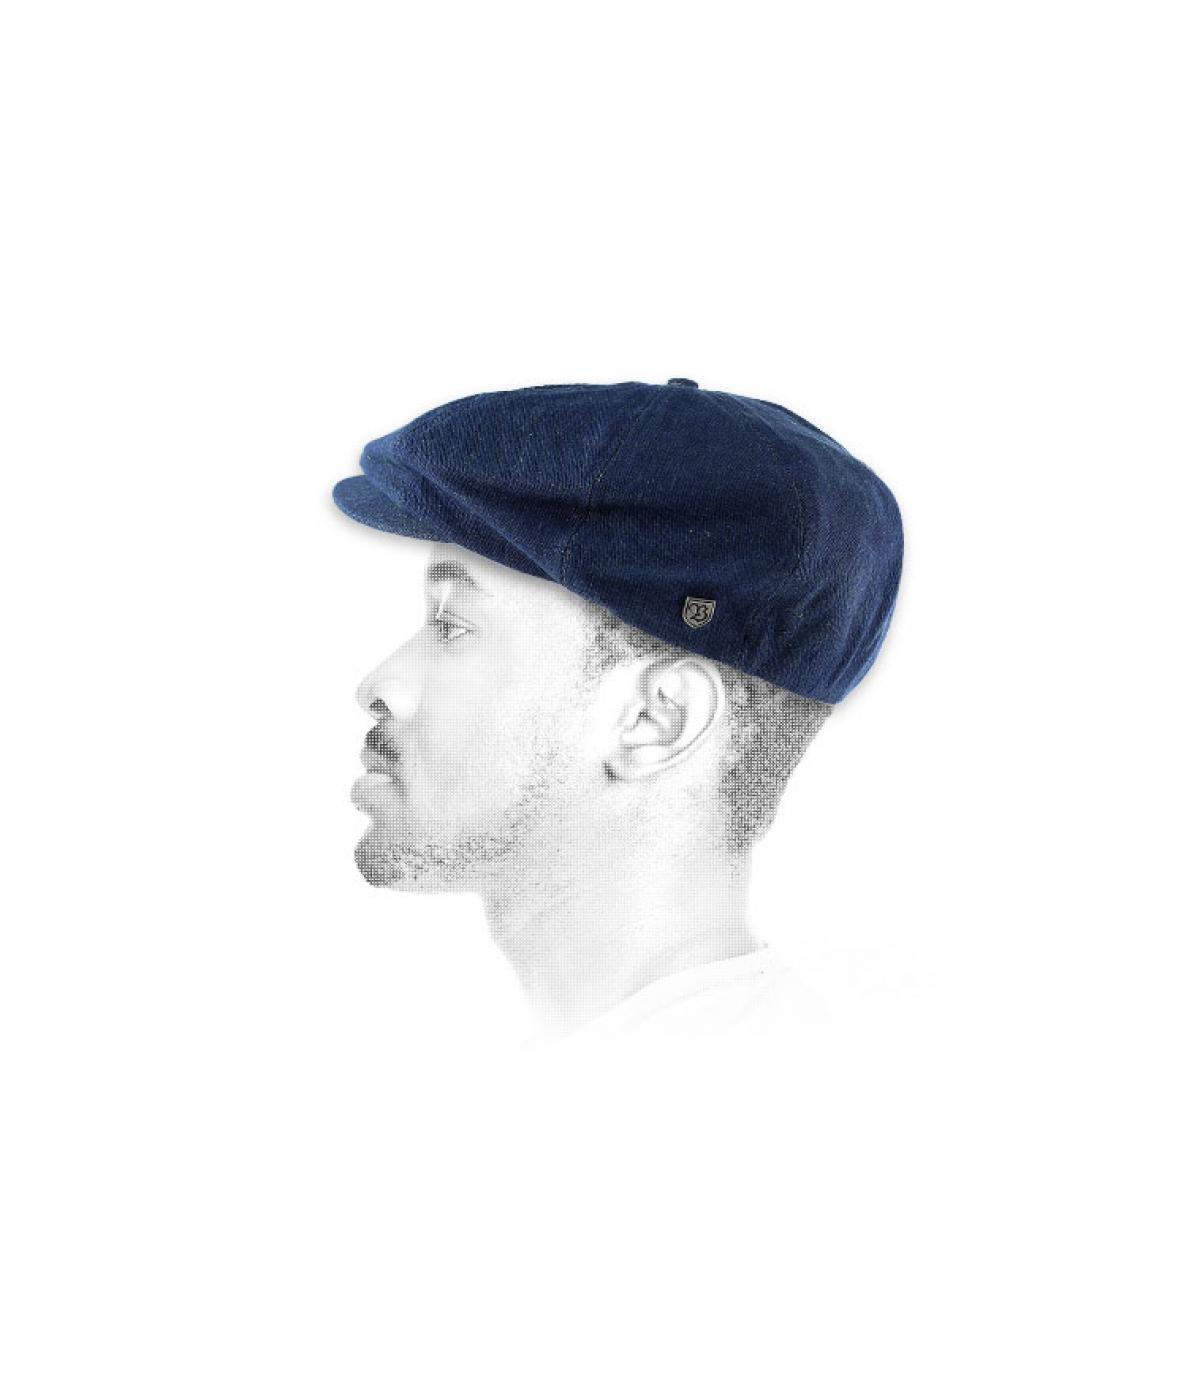 Denim newboys cap